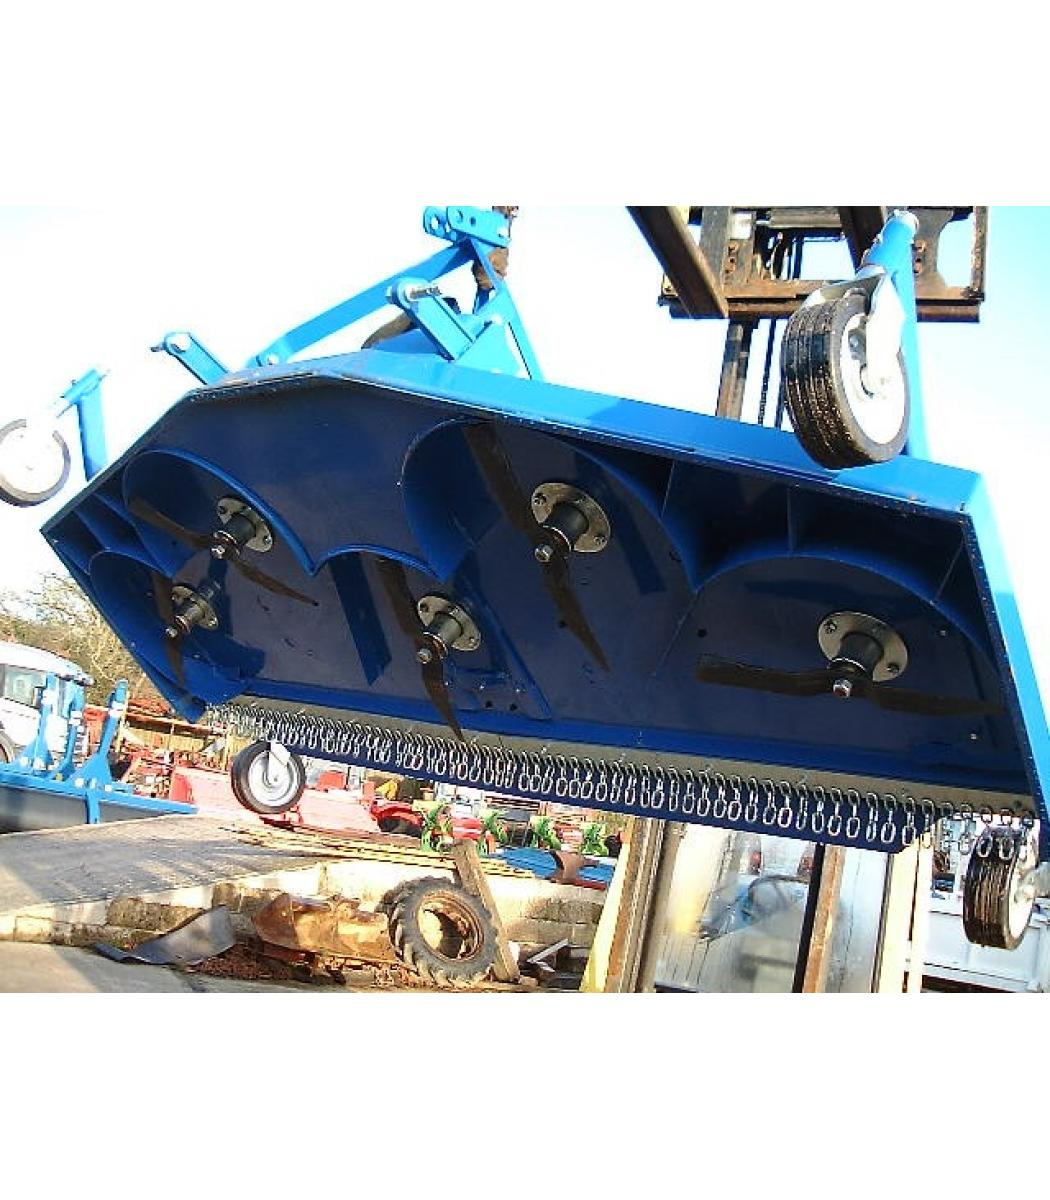 John Deere Gator Prices >> New Sitrex SM230 Finishing Mower